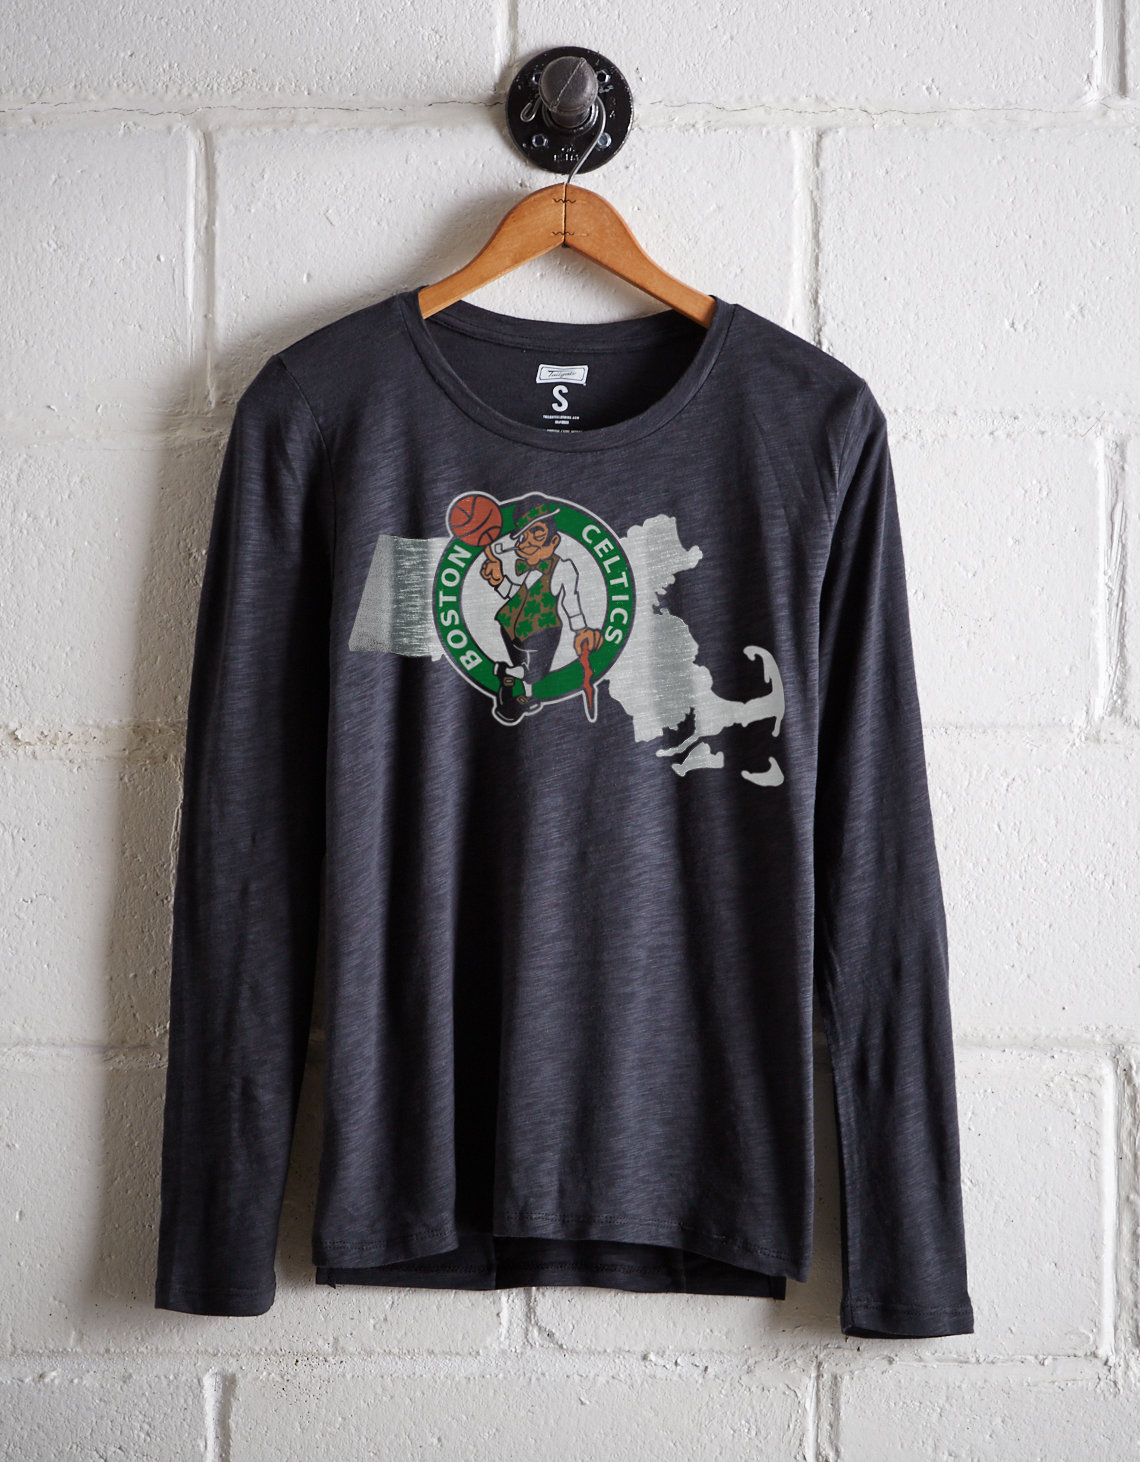 881acdcd4f309 Tailgate Women s Boston Celtics Long Sleeve T-Shirt